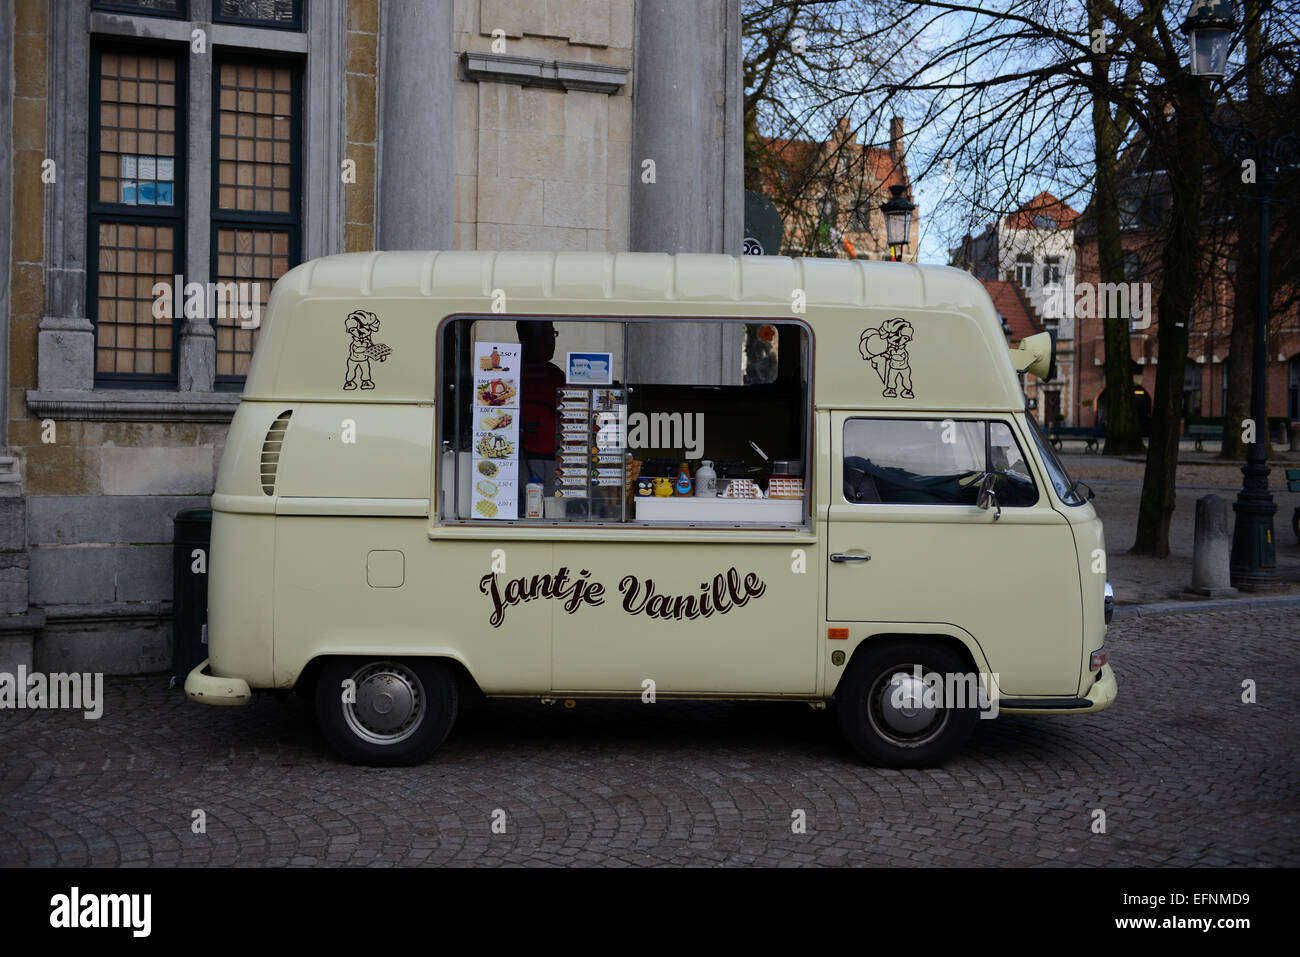 Jantje Vanille Street Food Truck, Brugge, Belgium - Stock Image